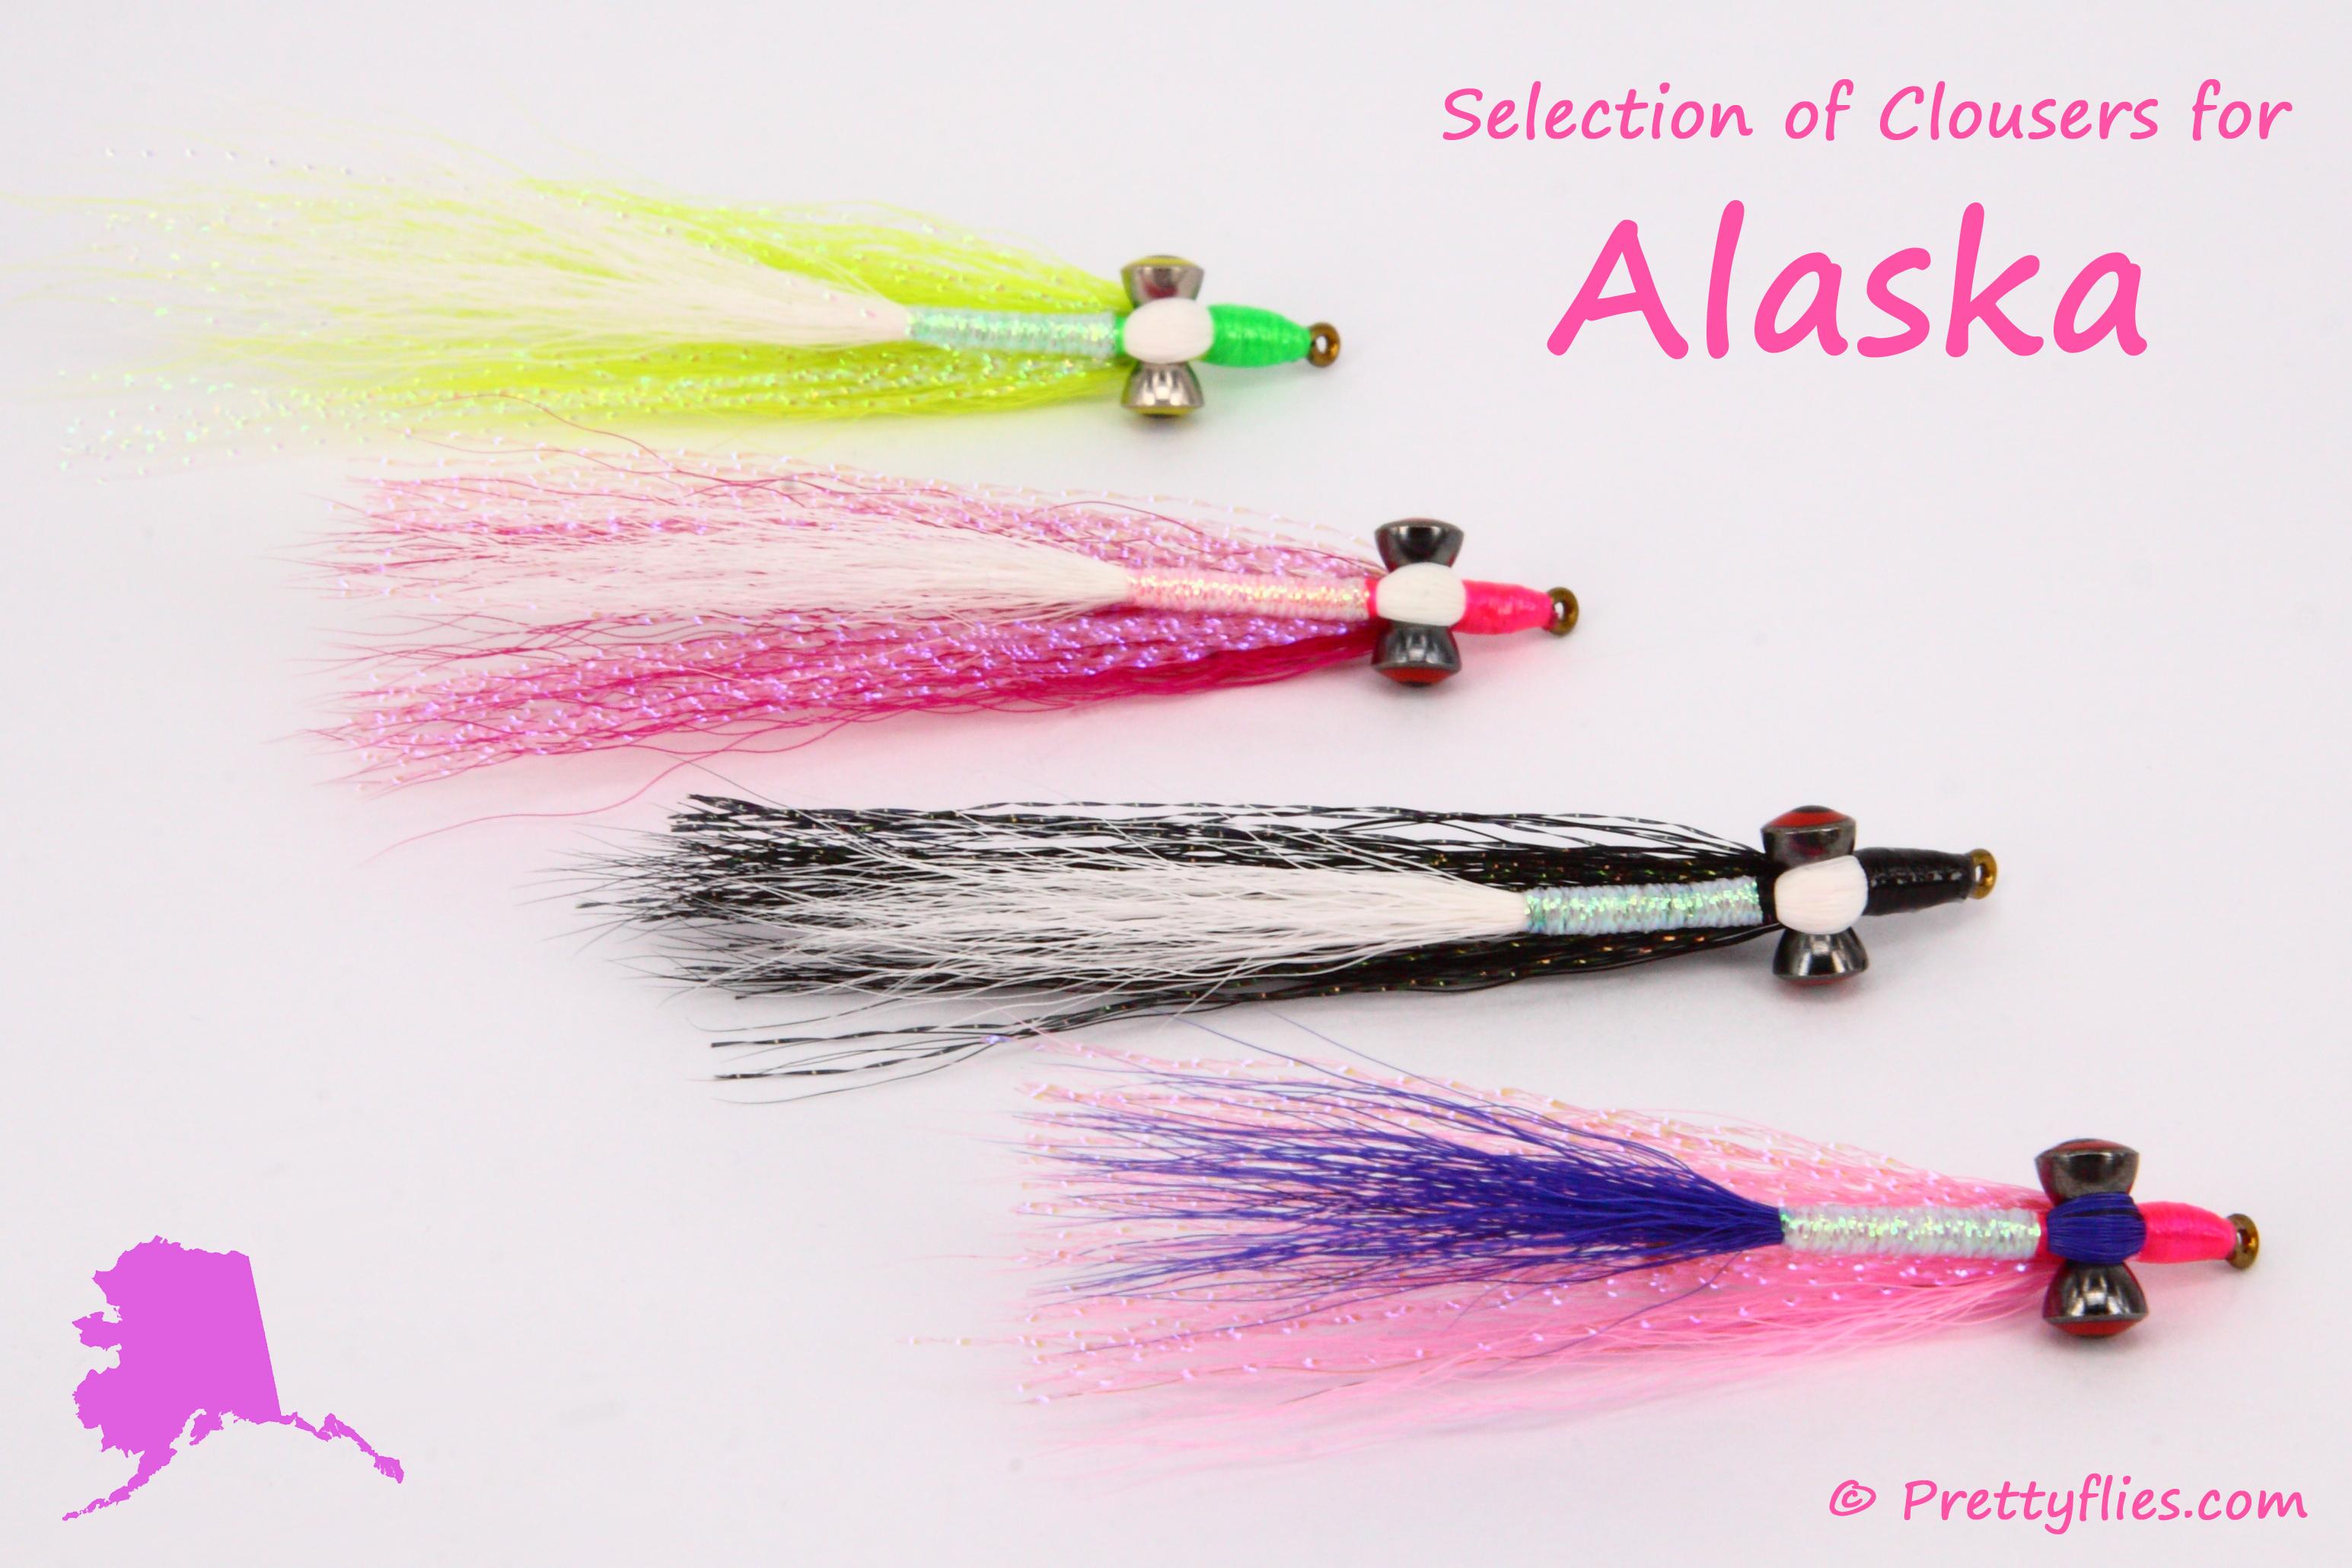 Selection of Clousers for Alaska.jpg